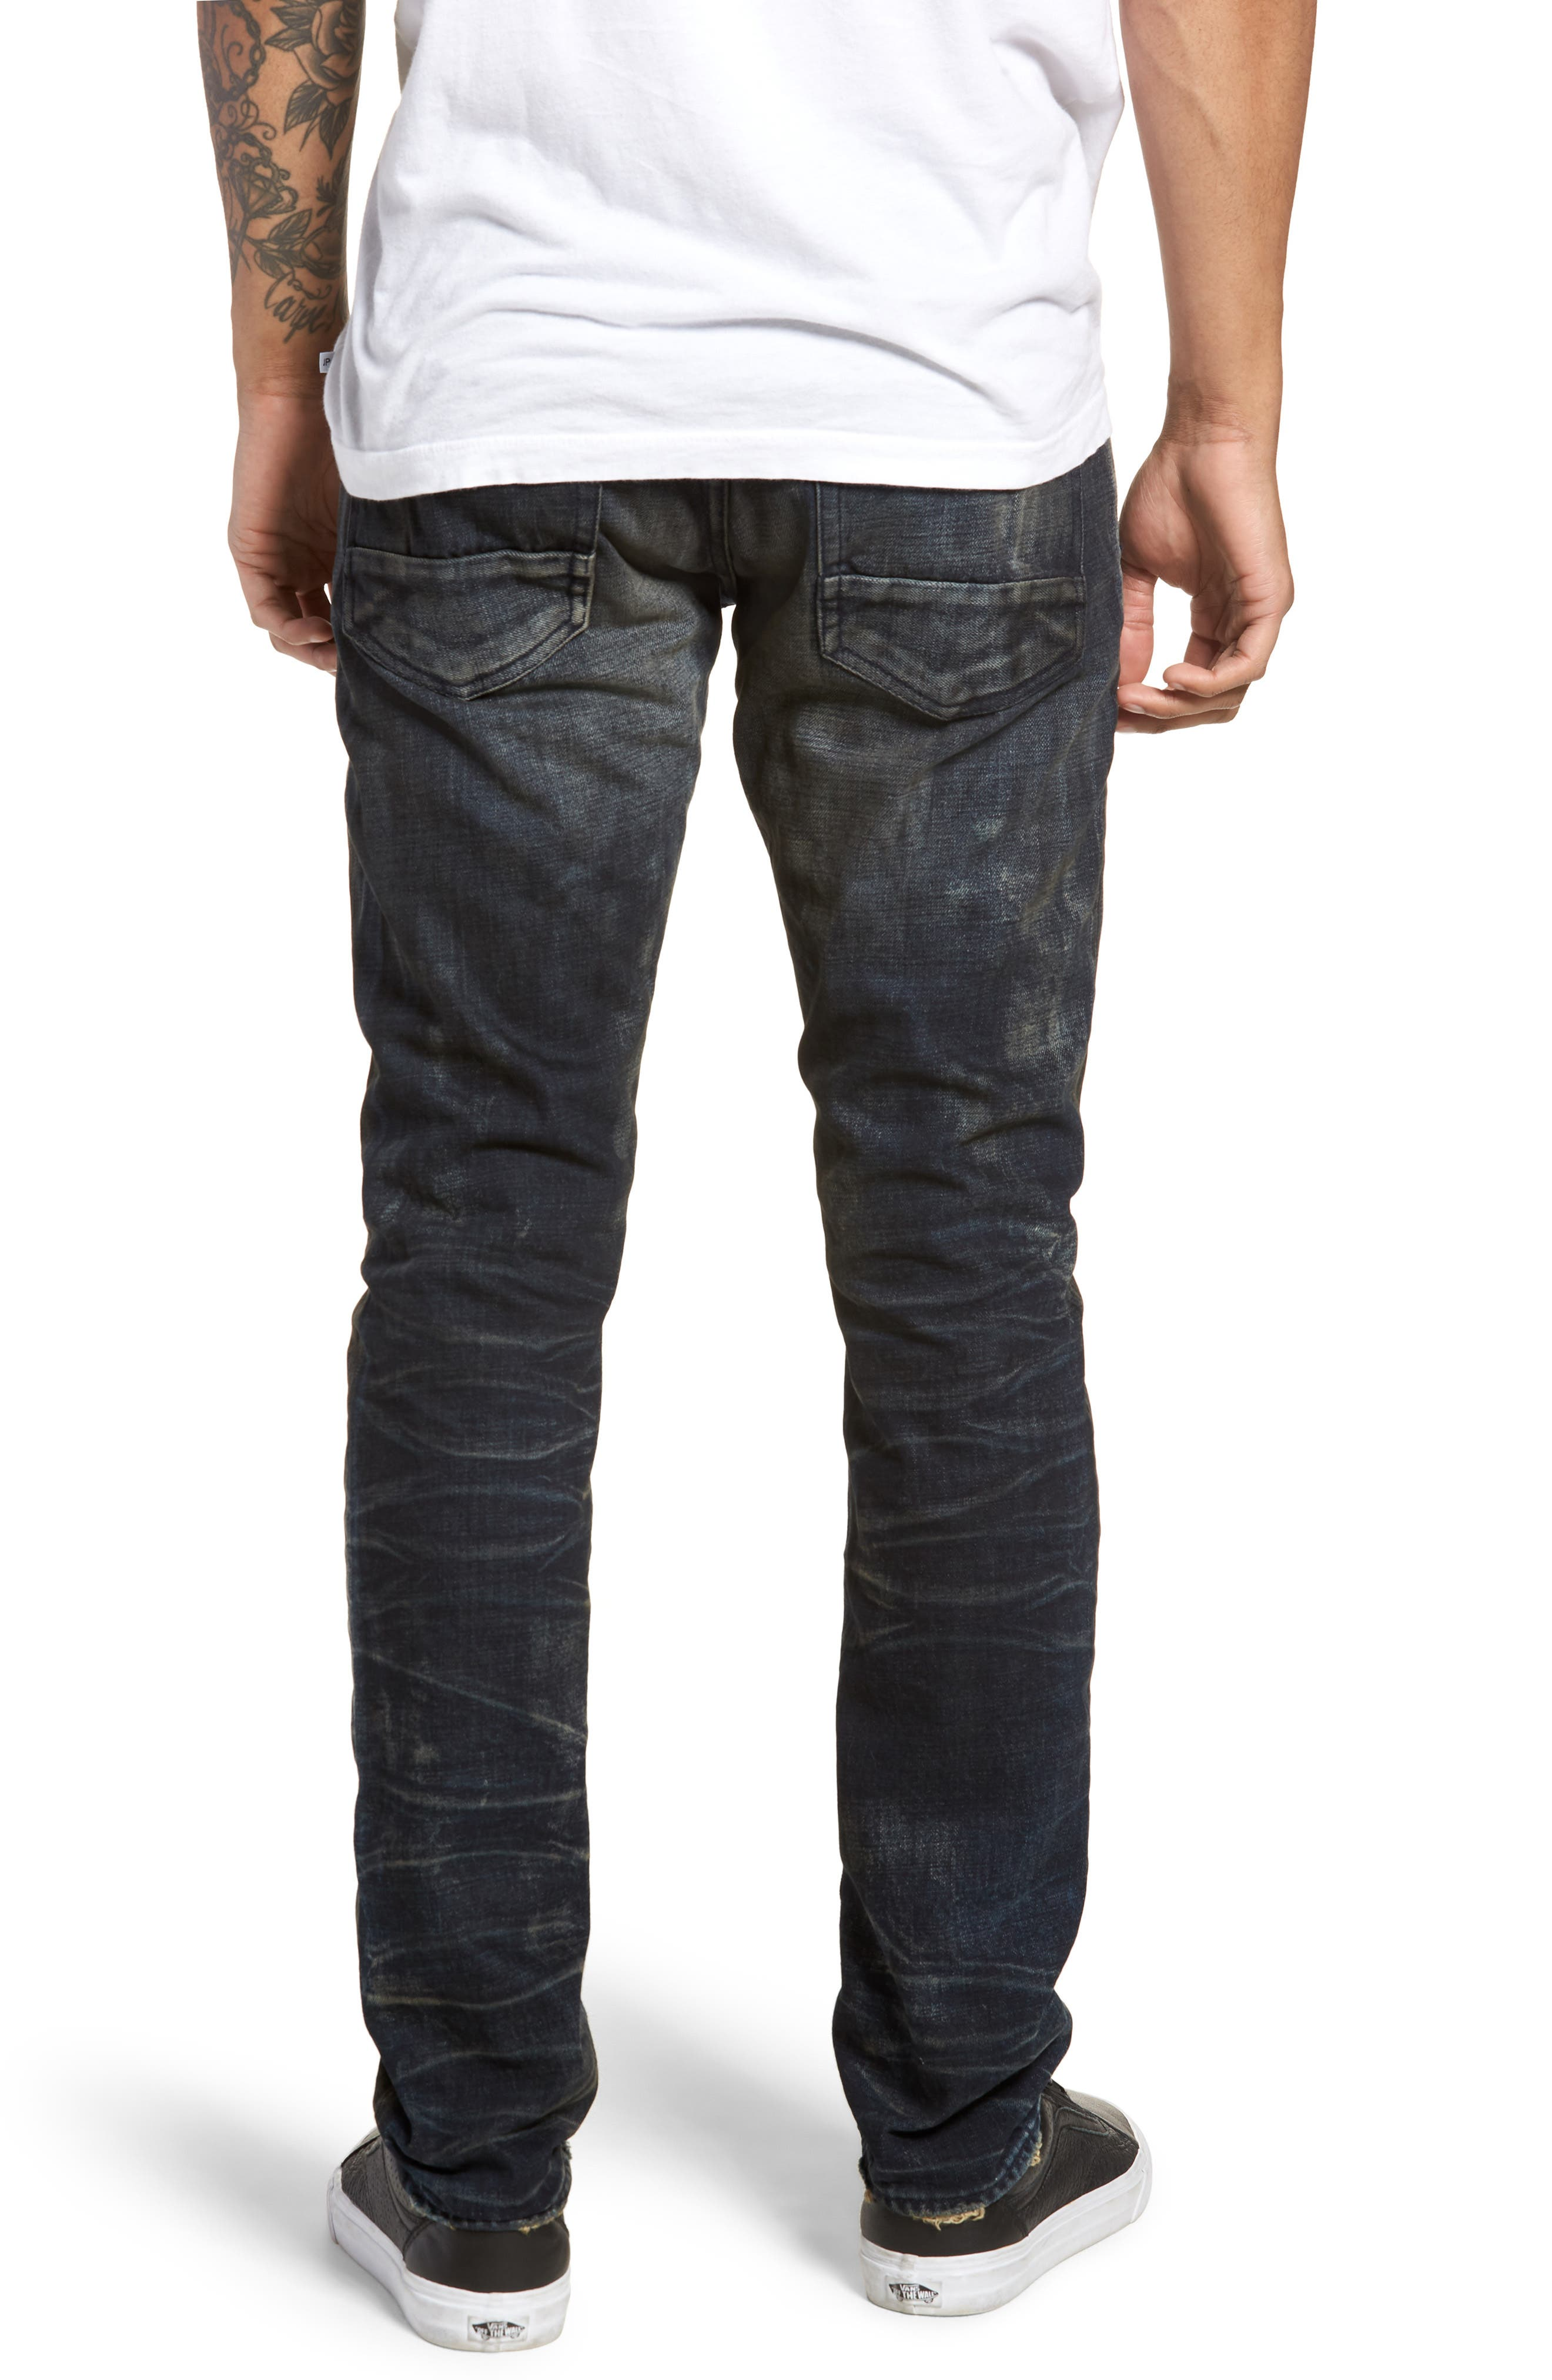 Demon Slim Straight Fit Jeans,                             Alternate thumbnail 2, color,                             Linger